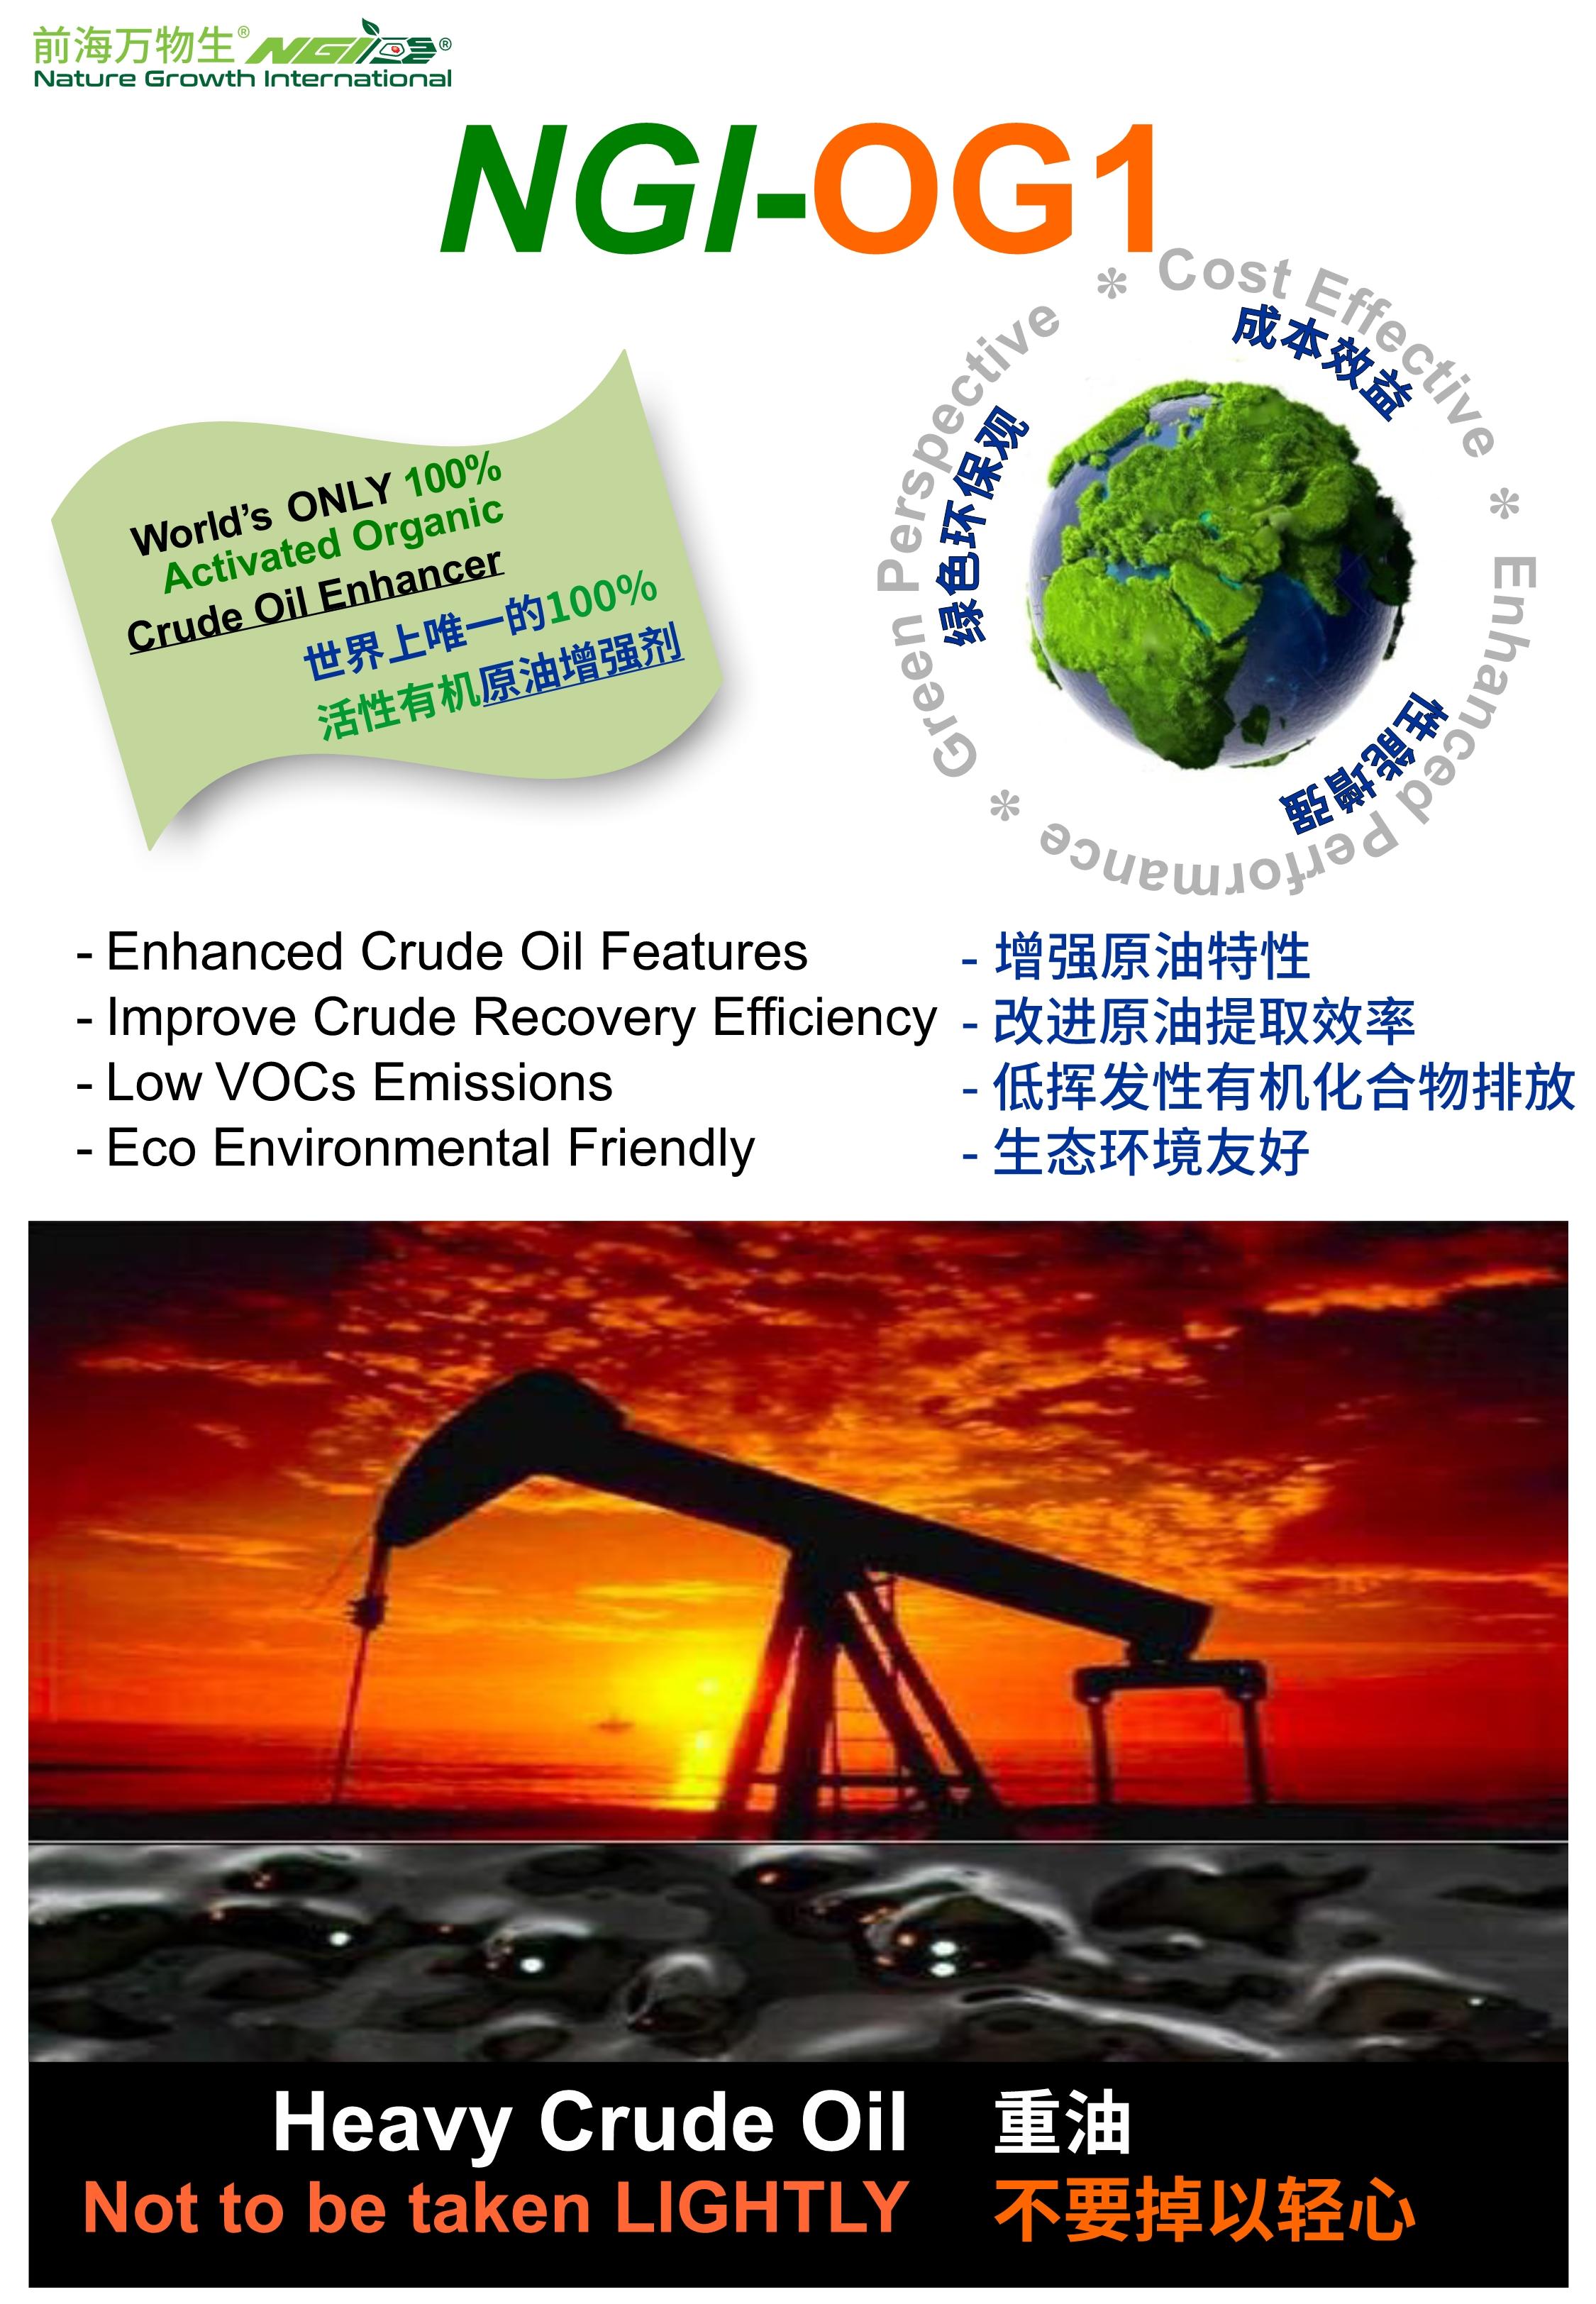 德赢Vwin-生物石油公司NGI-OG1中英20190521v3_jpg-德赢Vwin-生物石油公司NGI-OG1中英20190521v3_2